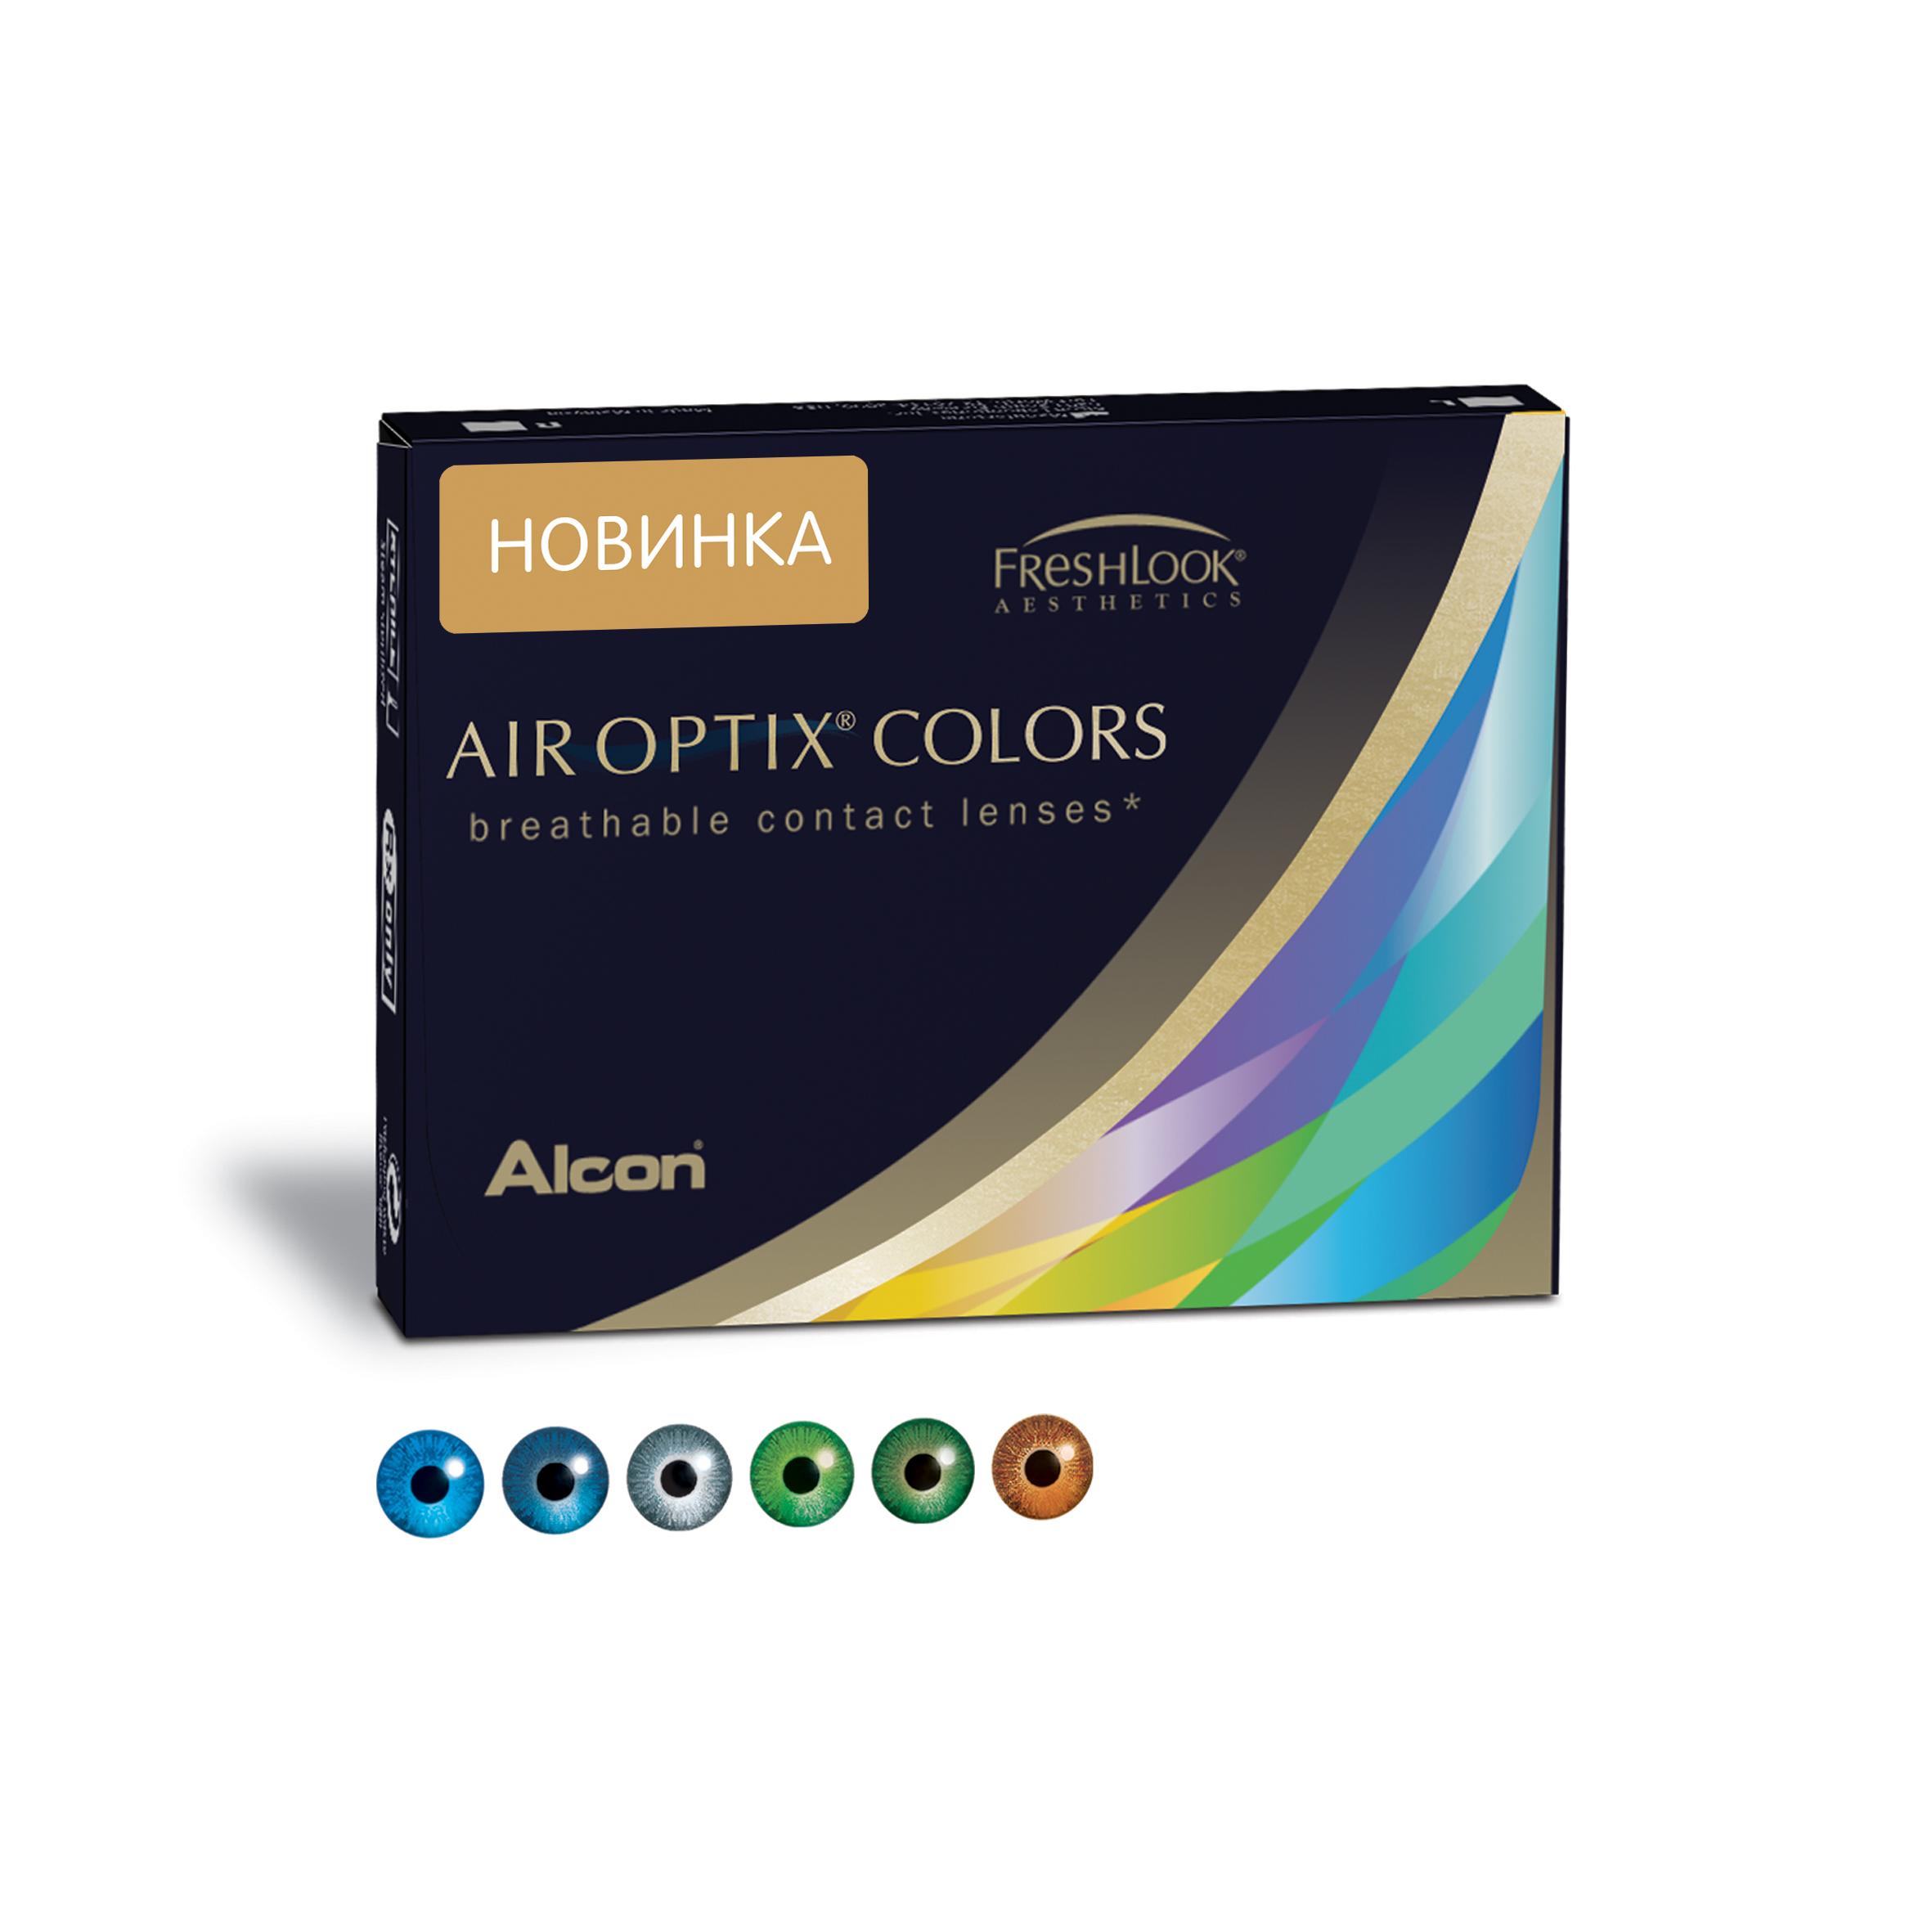 Аlcon контактные линзы Air Optix Colors 2 шт -2.75 Sterling Gray31746192Мягкие контактные линзы